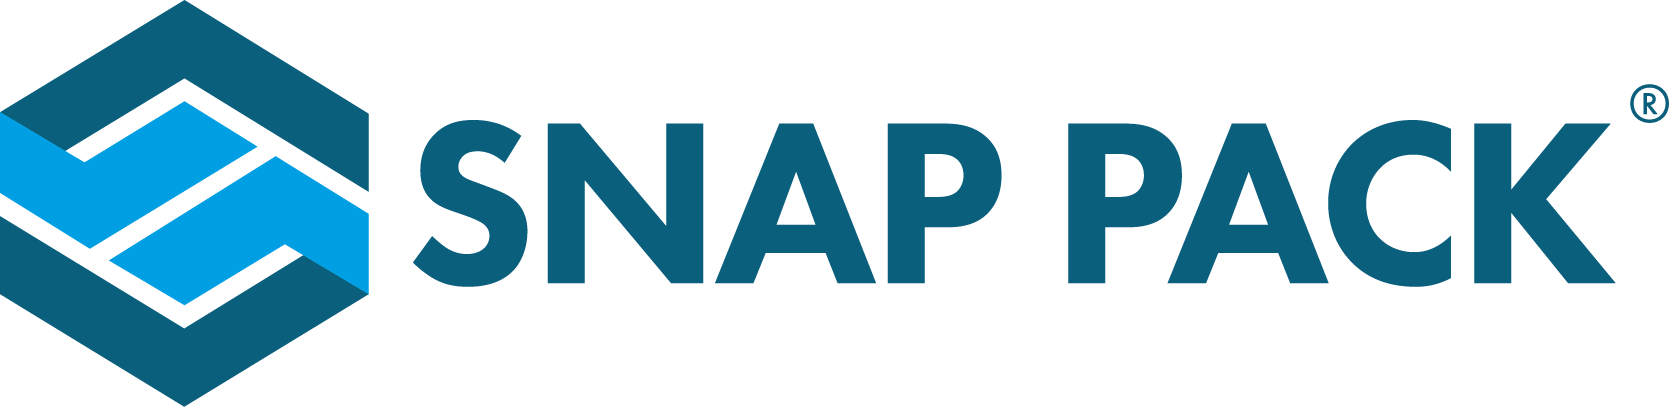 Snap-Pack-logo-breddeformat